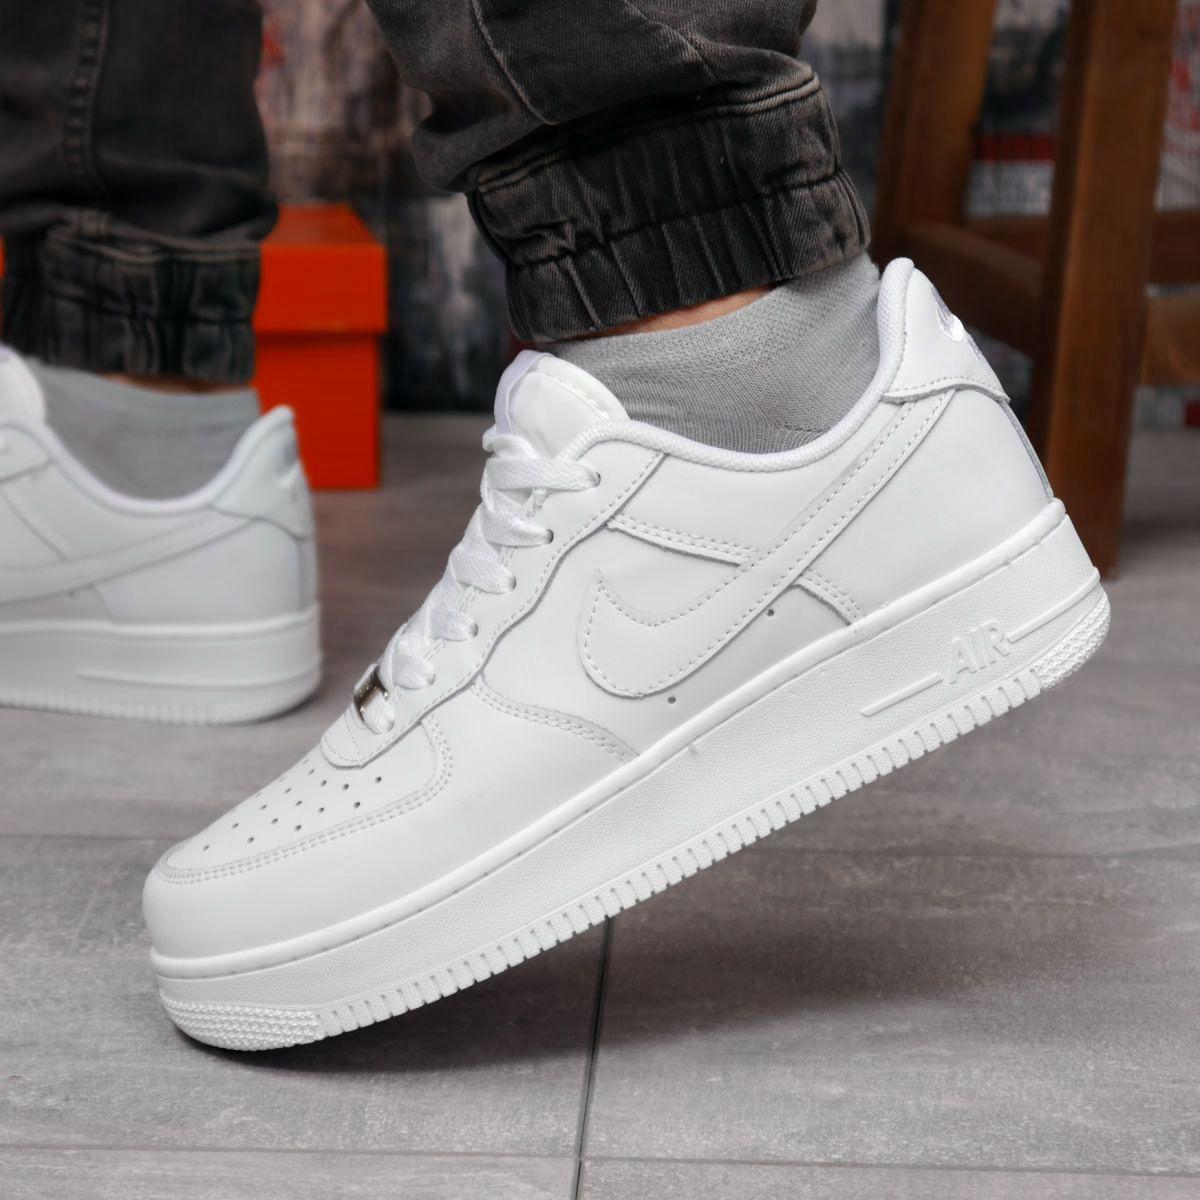 Кроссовки мужские 18231 ► Nike Air Force 1 (качество AAA), белые . [Размеры в наличии: 42,43,44,45,46]